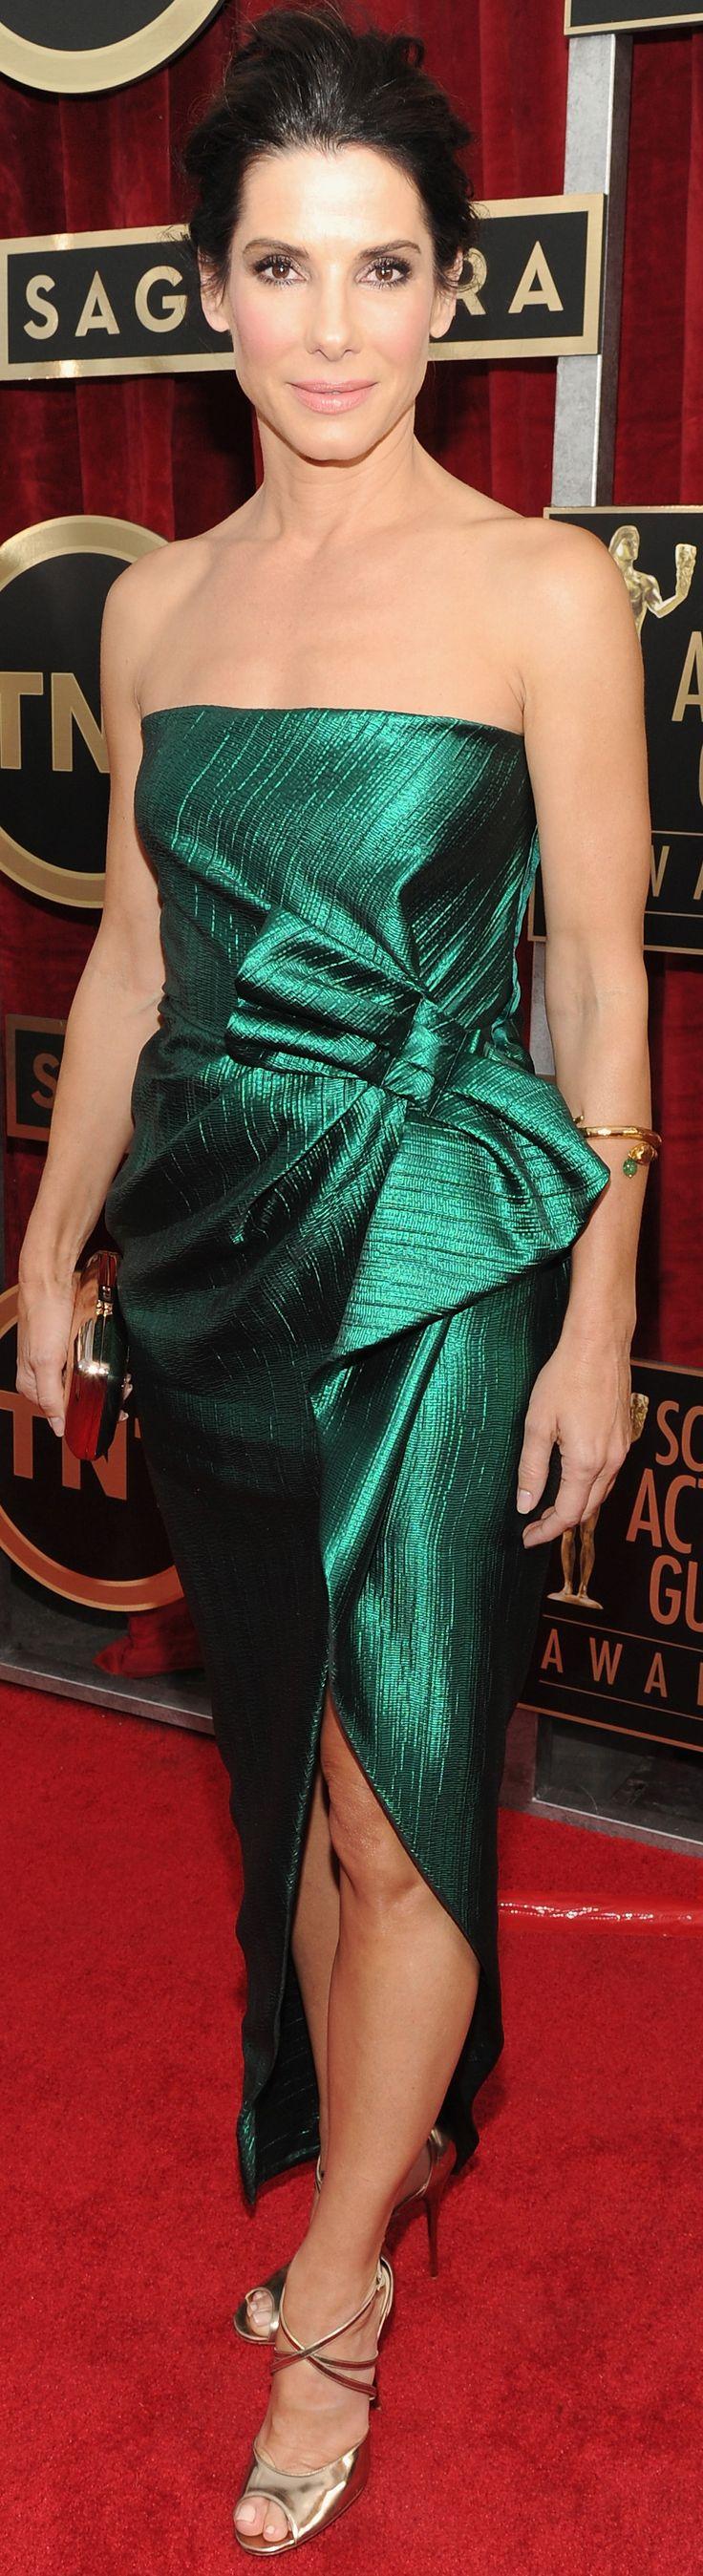 Sandra Bullock was a dream in a green Lanvin dress at the SAG Awards